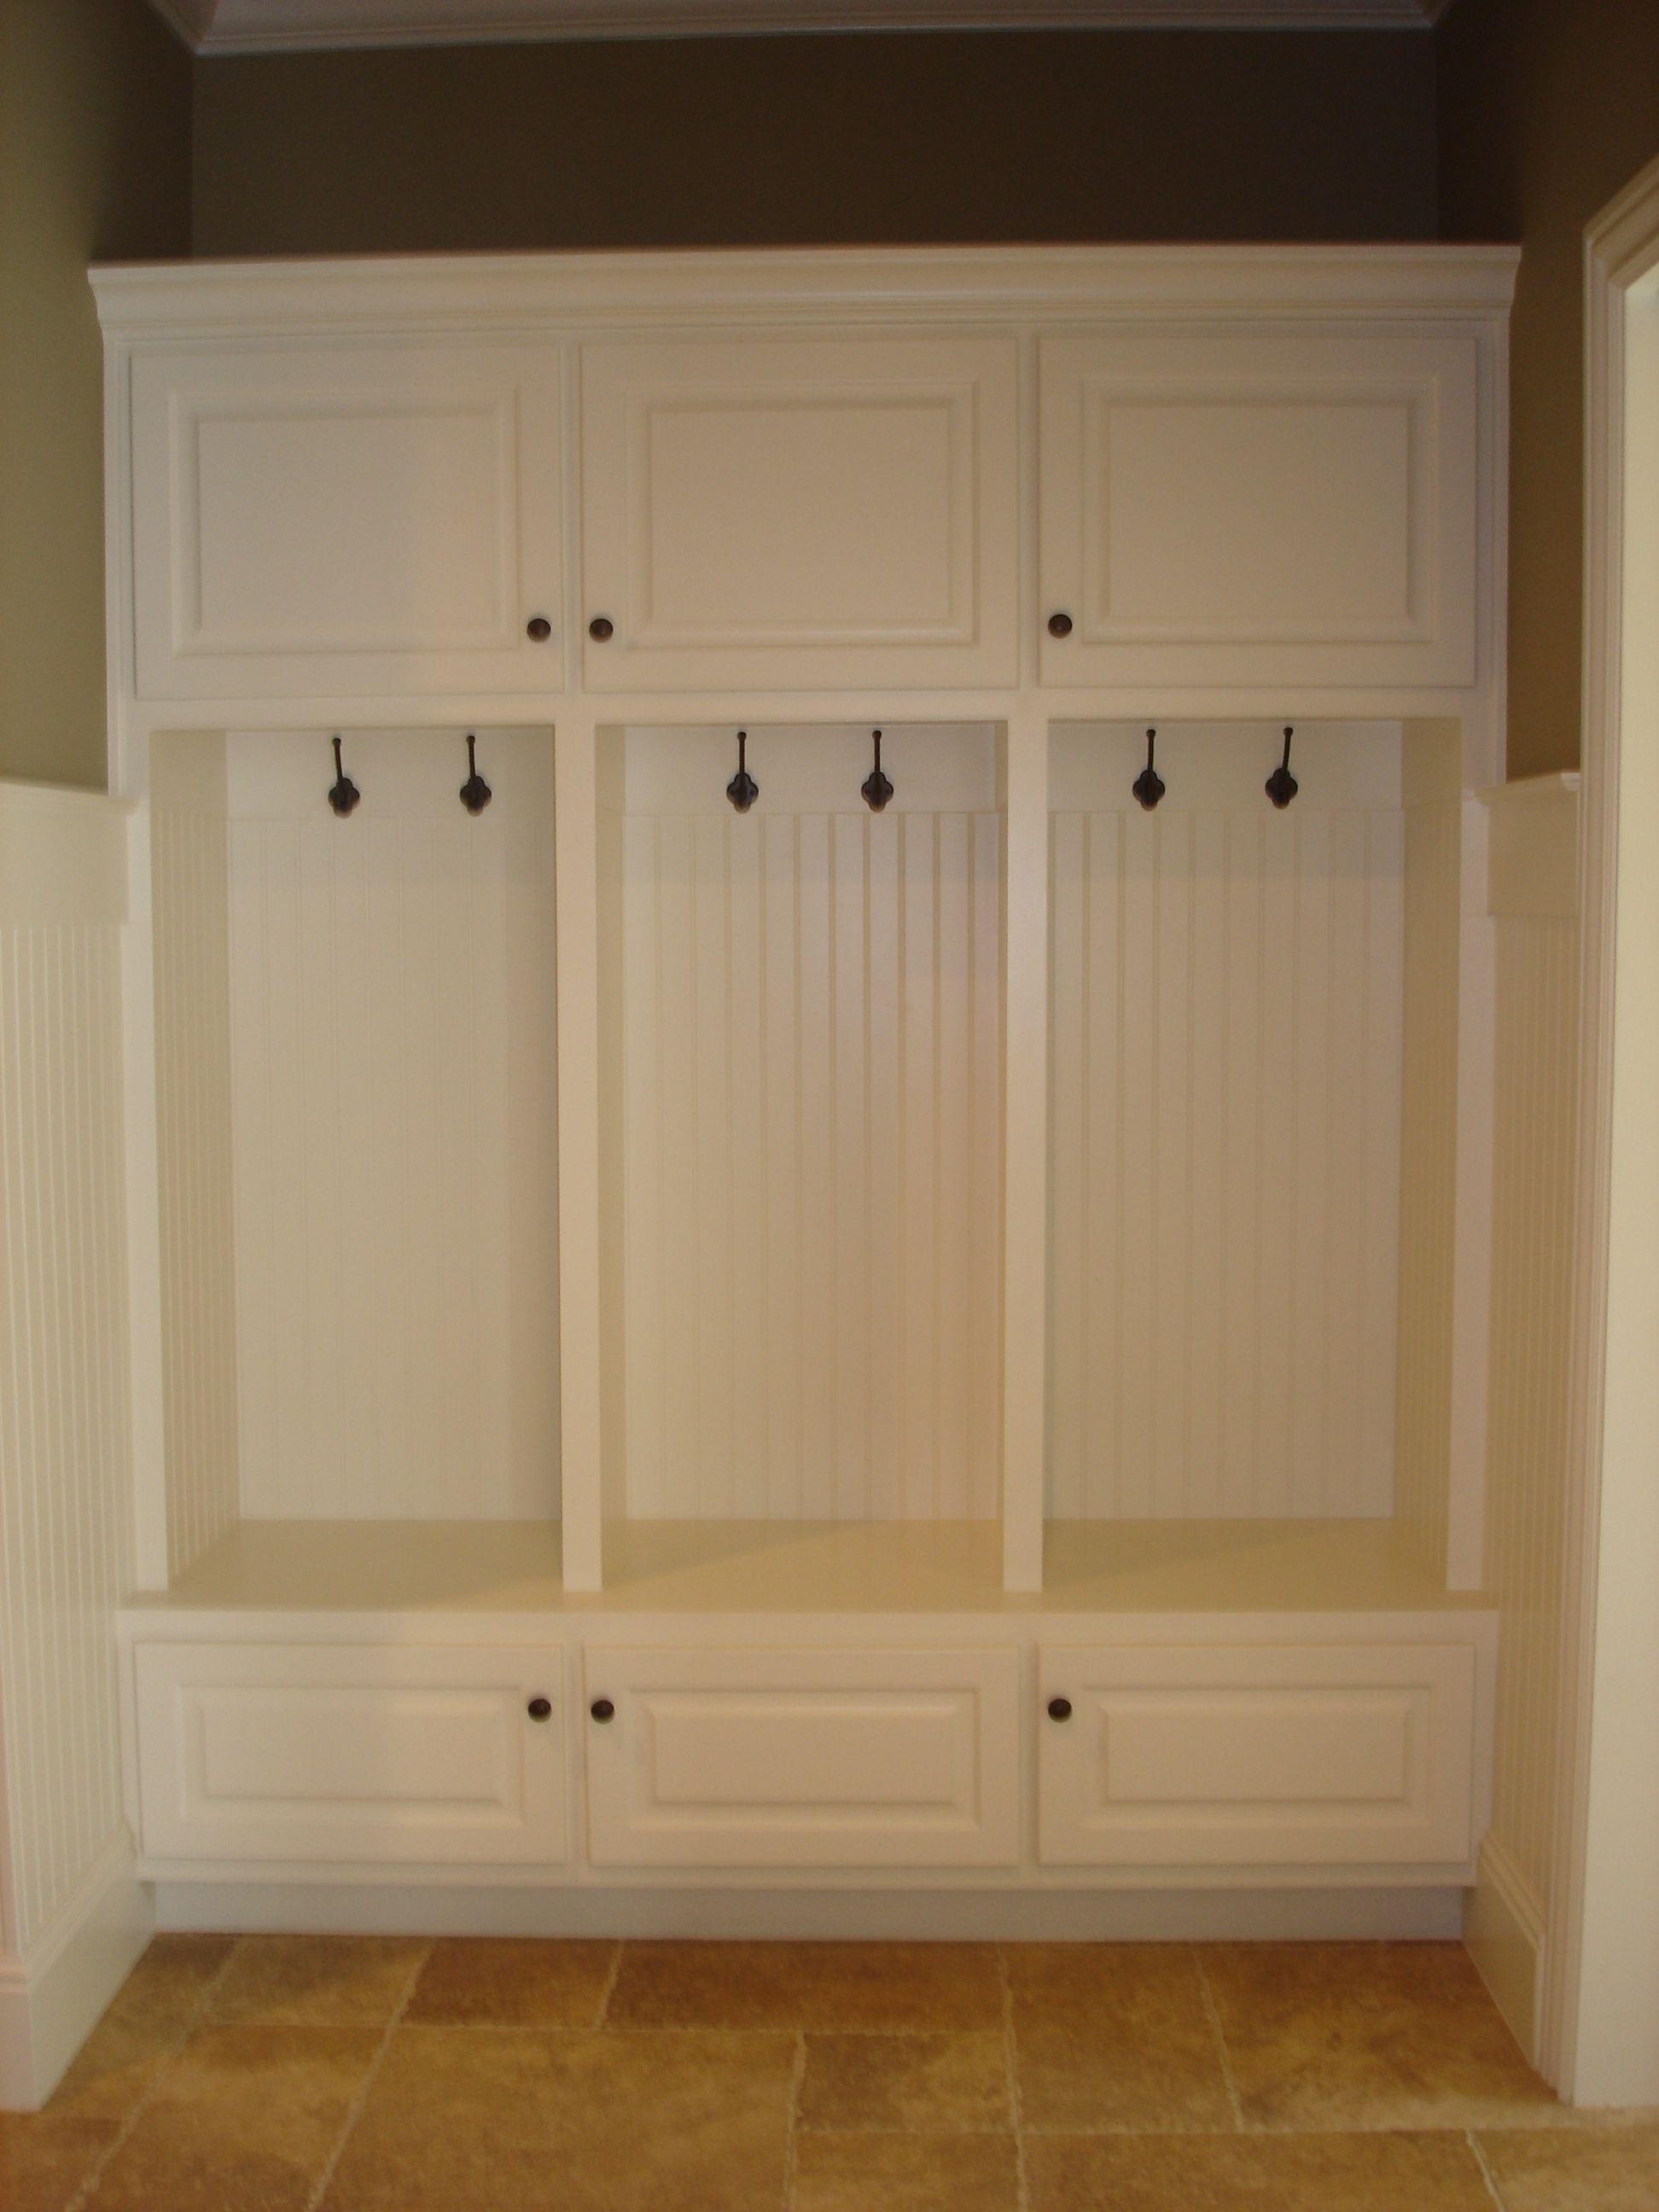 Amish Built Cabinets For Mudroom Mud Room Storage Log Home Living Mudroom Cabinets